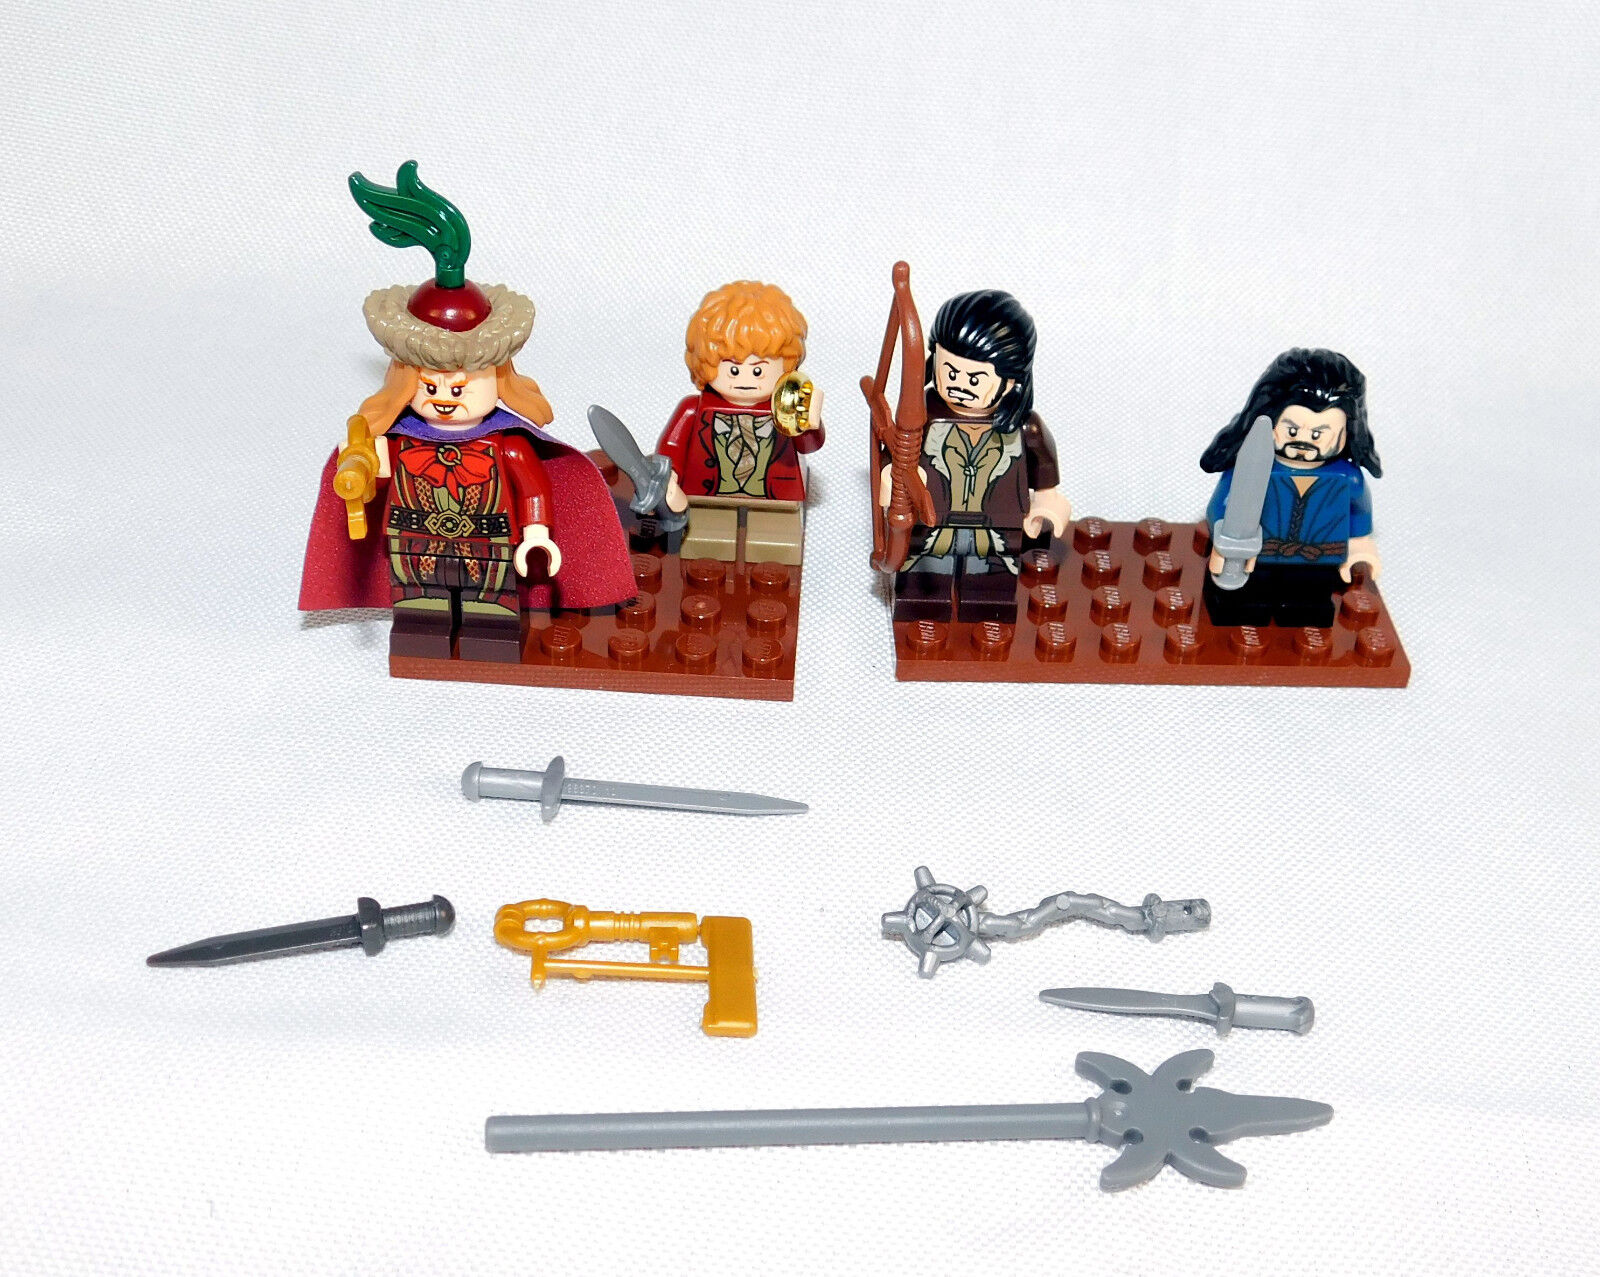 Lego Hobbit 79013 Lot of 4 Minifigures +Extras Bilbo Master Bard Lake Town Chase